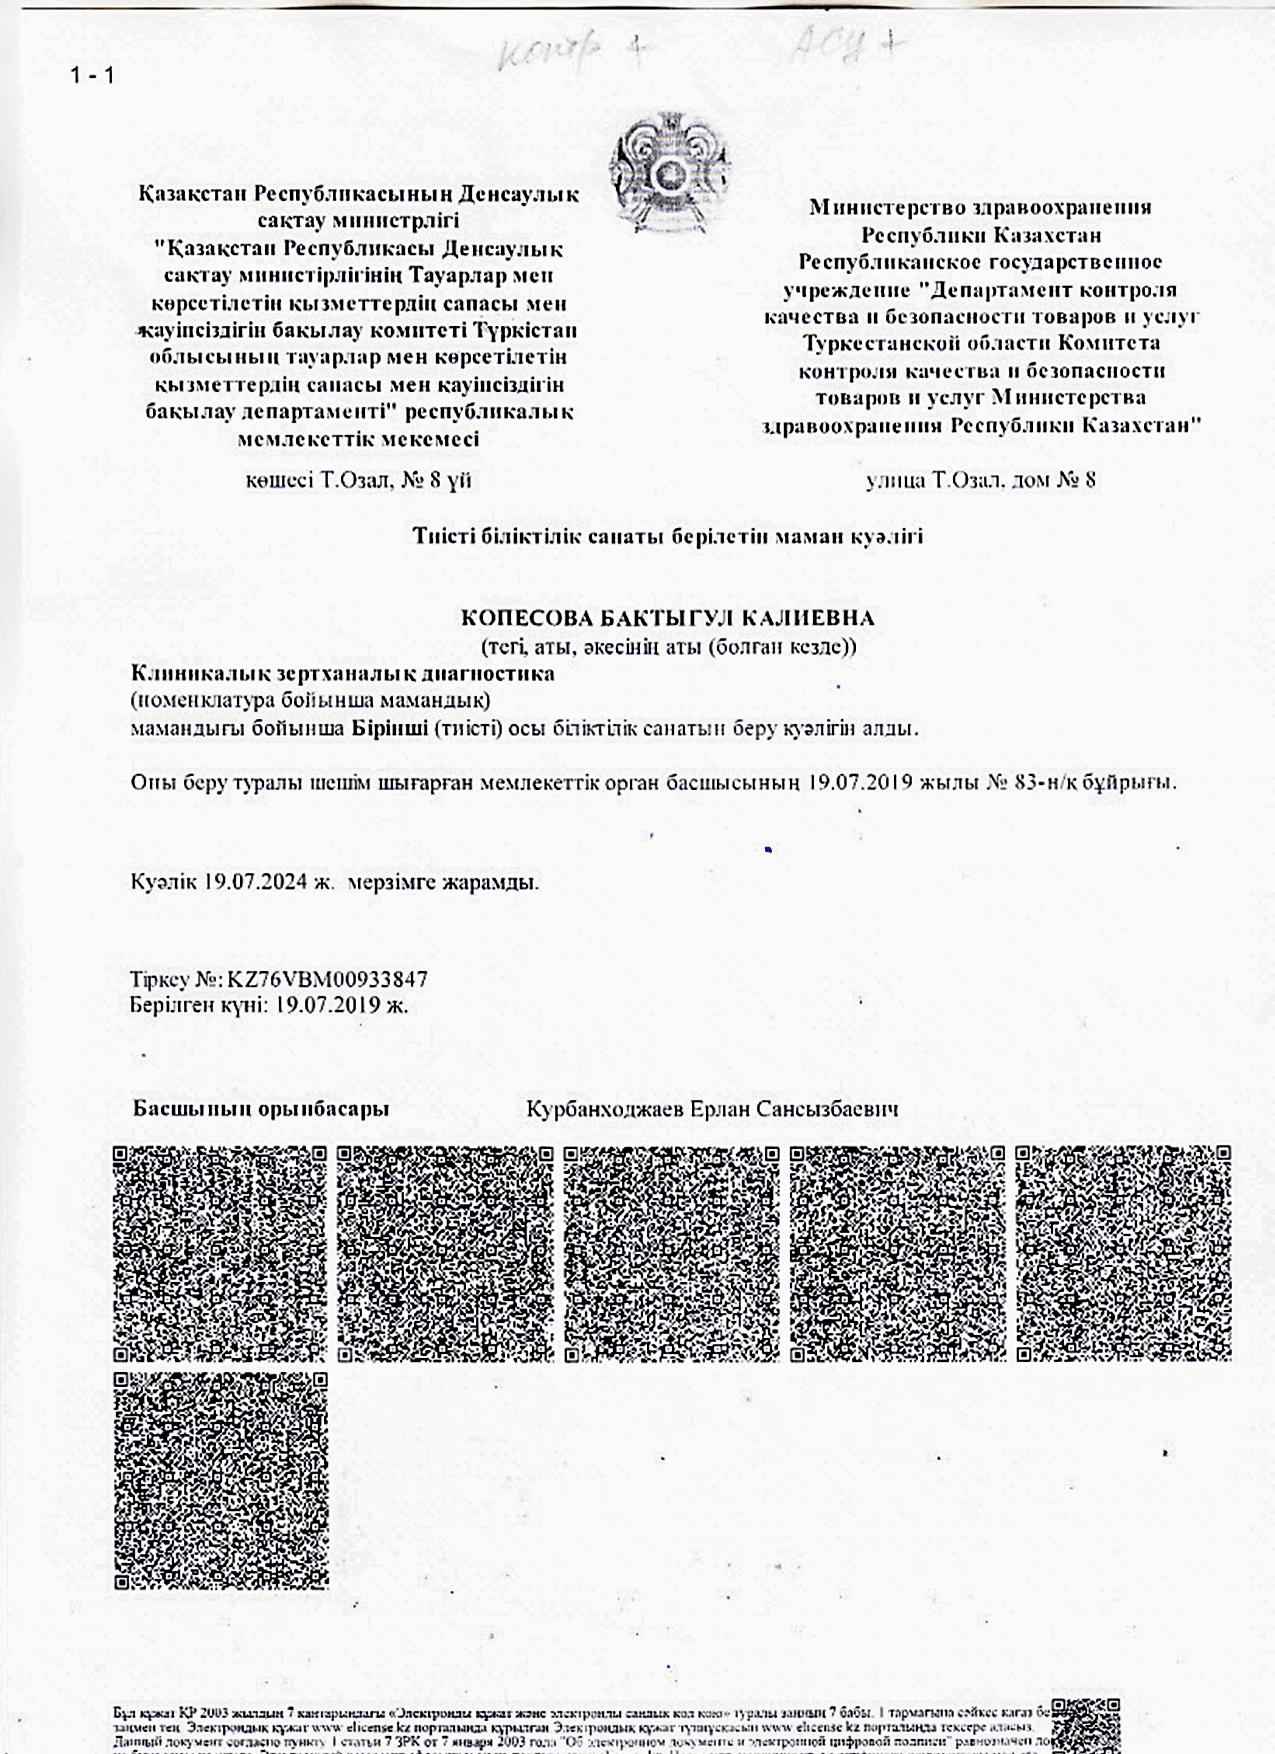 Сертификат Лаборанта клиники Akniet Shipa сайрамский р-н. с. Карабулак